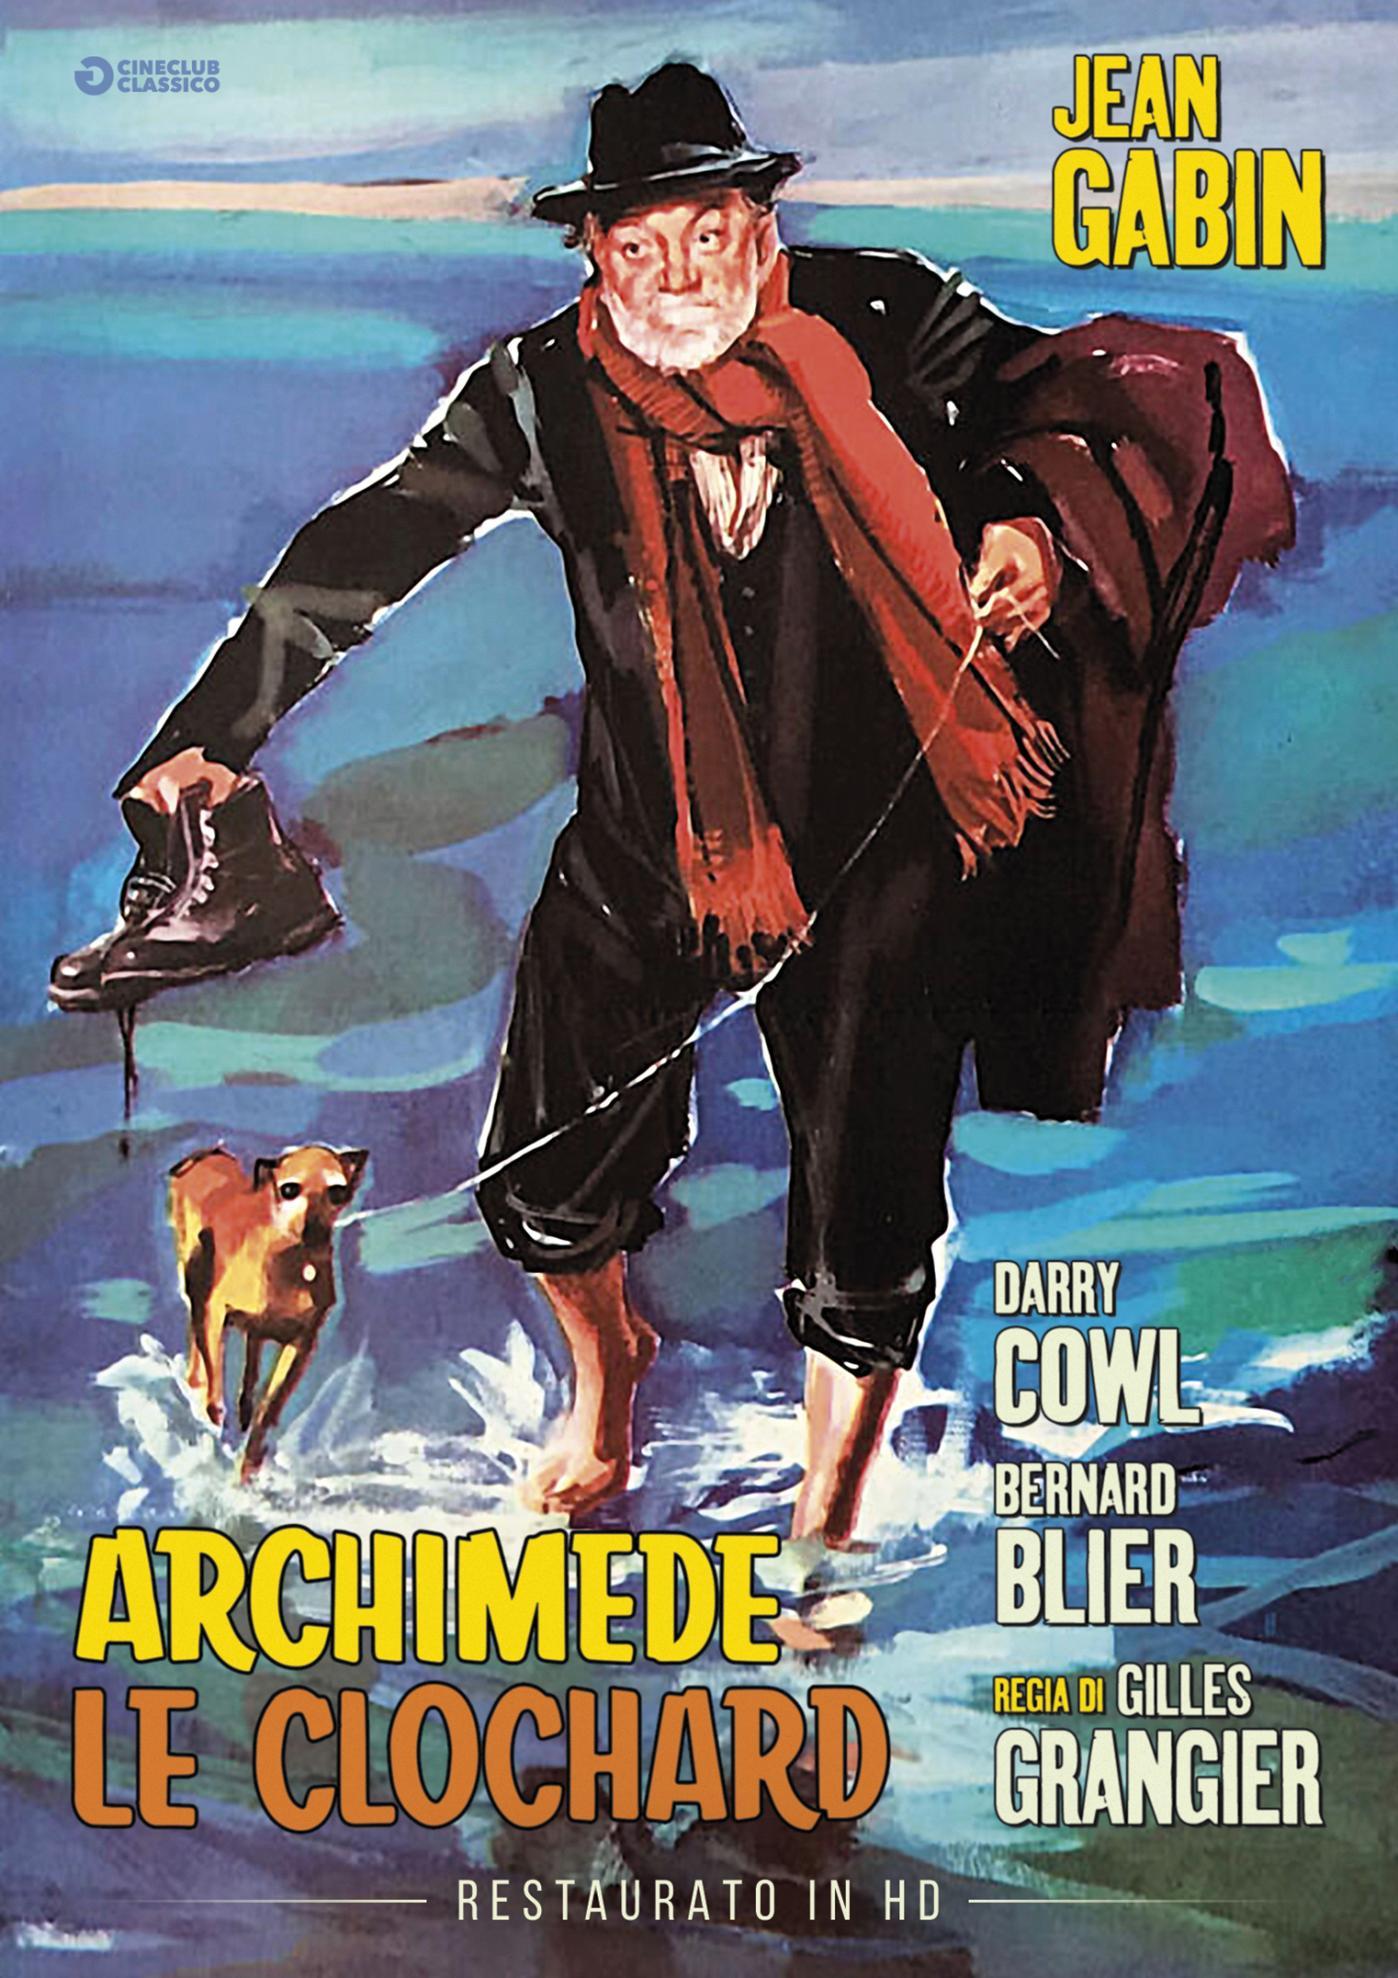 ARCHIMEDE LE CLOCHARD (RESTAURATO IN HD) (DVD)